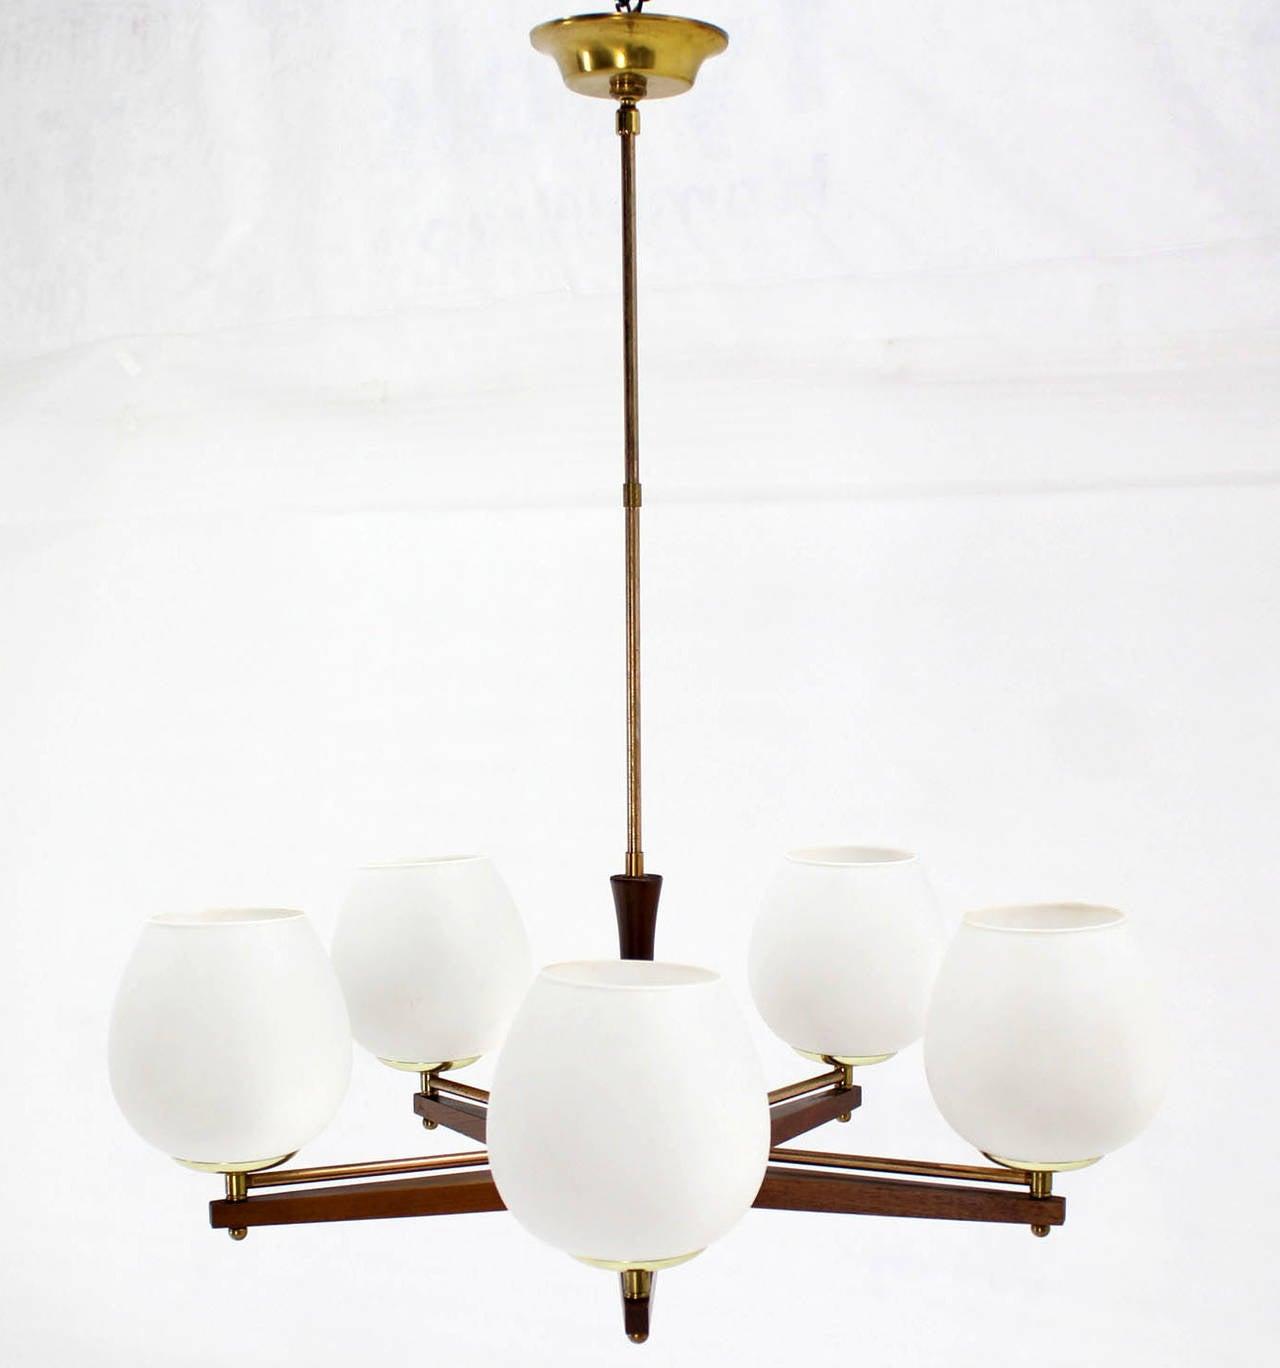 champagne glass shade danish modern light fixture . champagne glass shade danish modern light fixture at stdibs